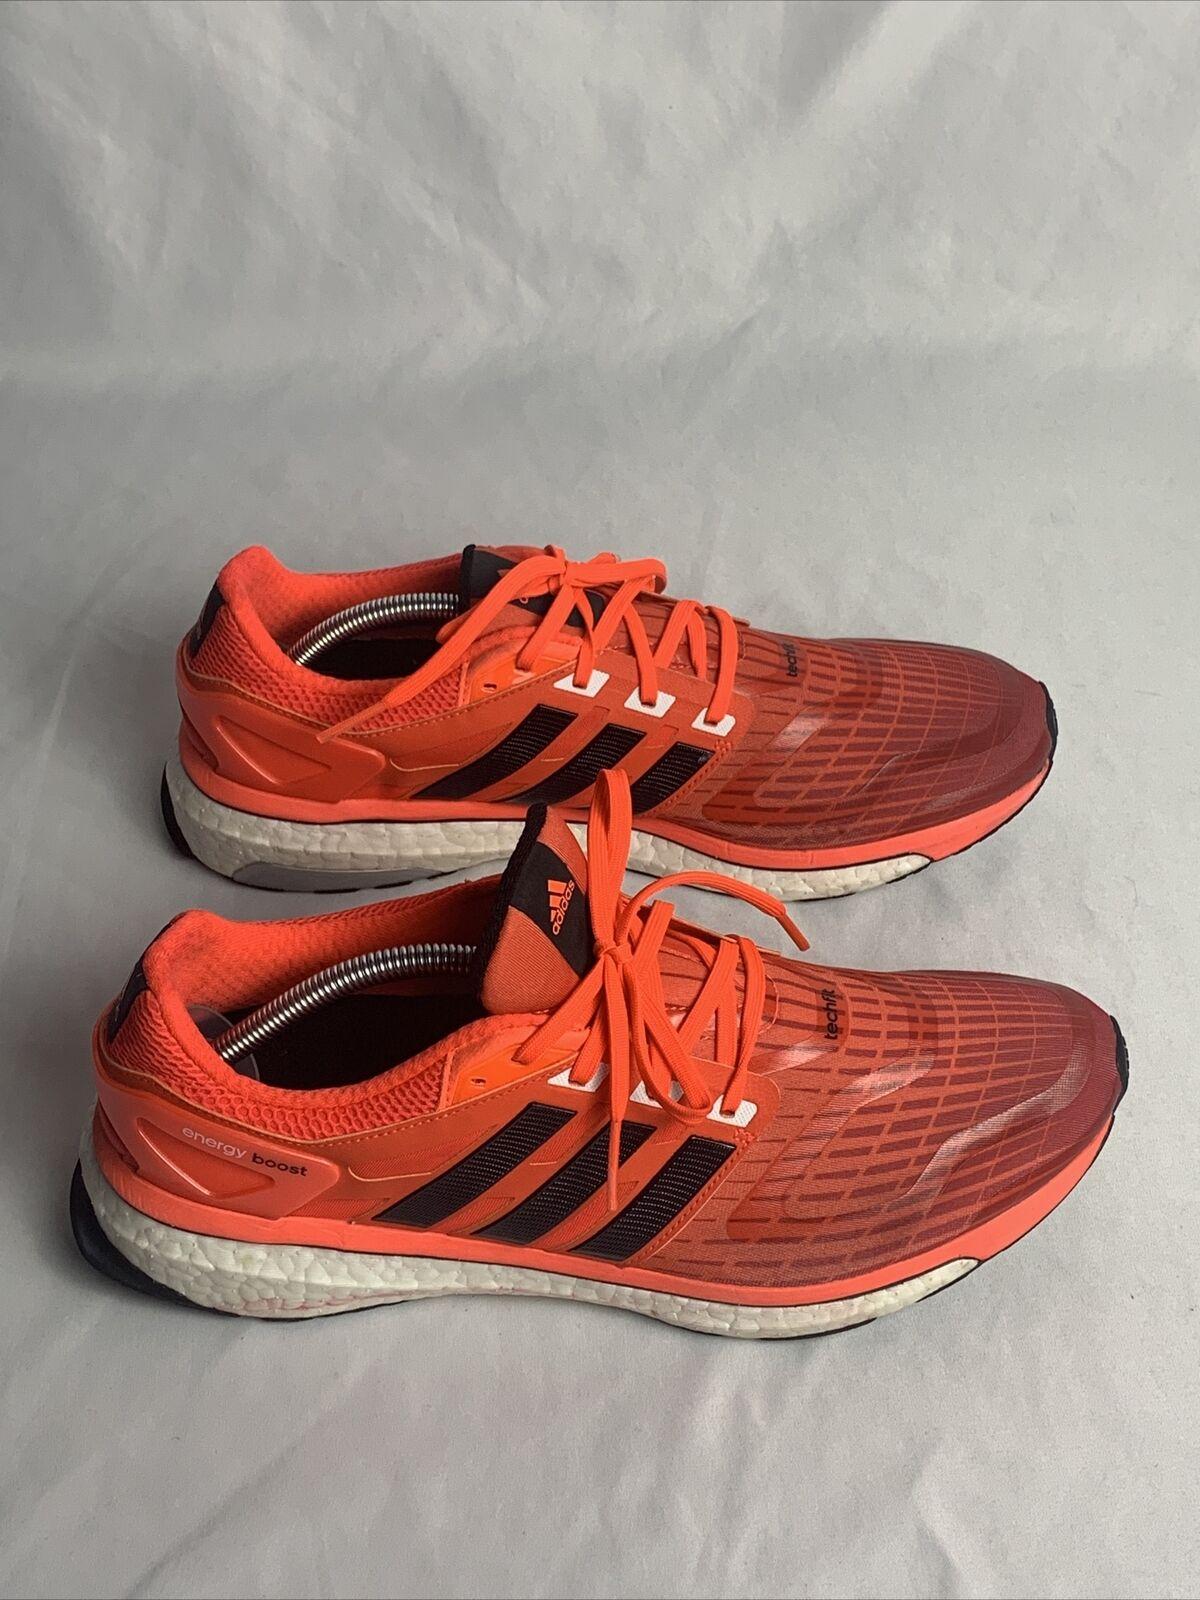 Men's Adidas Energy Boost Running Shoes Q33957 Orange… - Gem